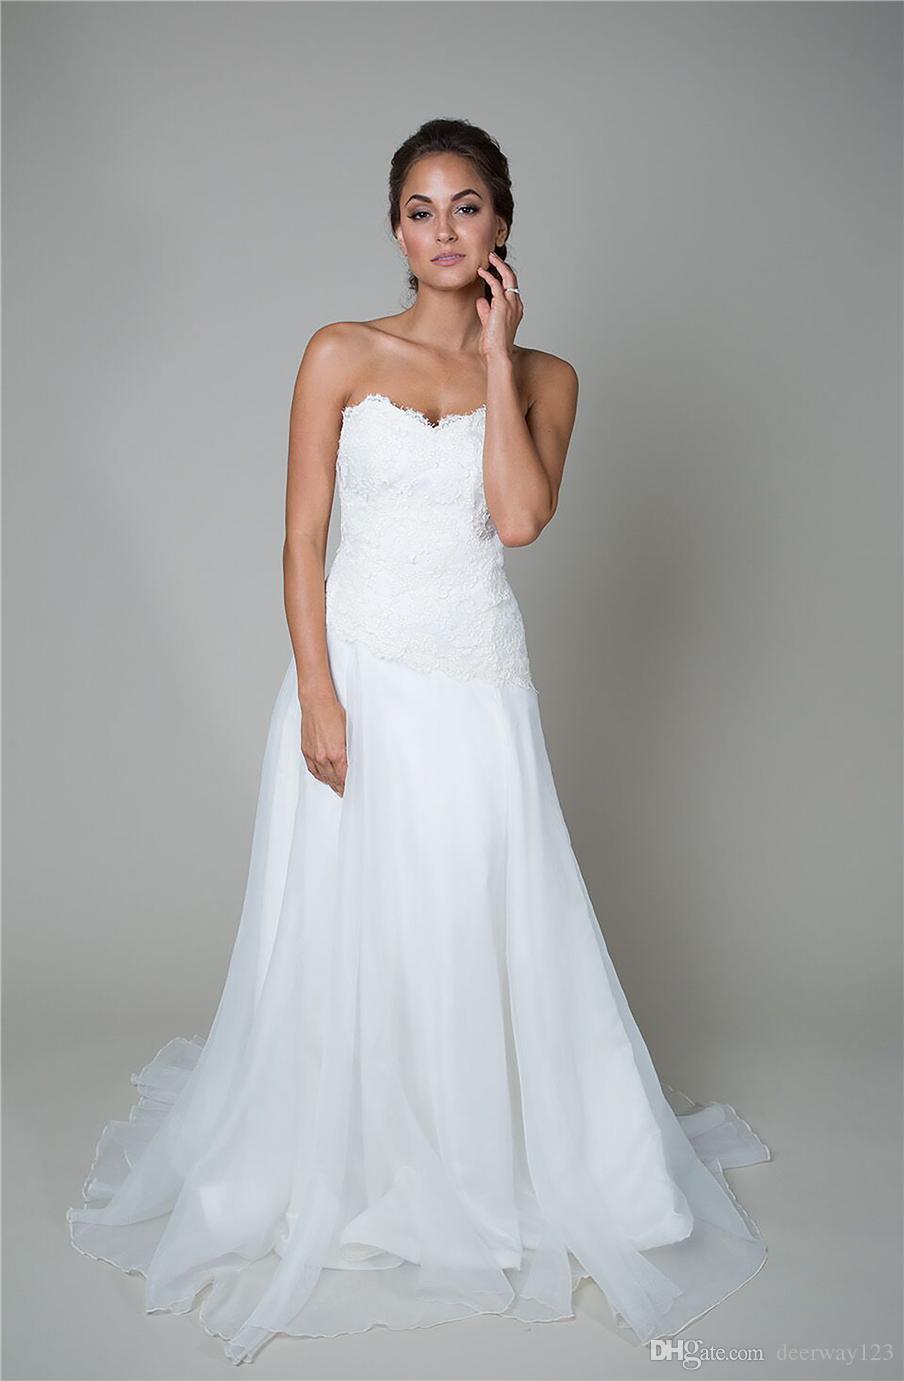 Wedding Dress Dropped Asymmetrical Waist Wedding Dress Low Back And a Silk Organza Applique Lace a-Line Bridal Dress